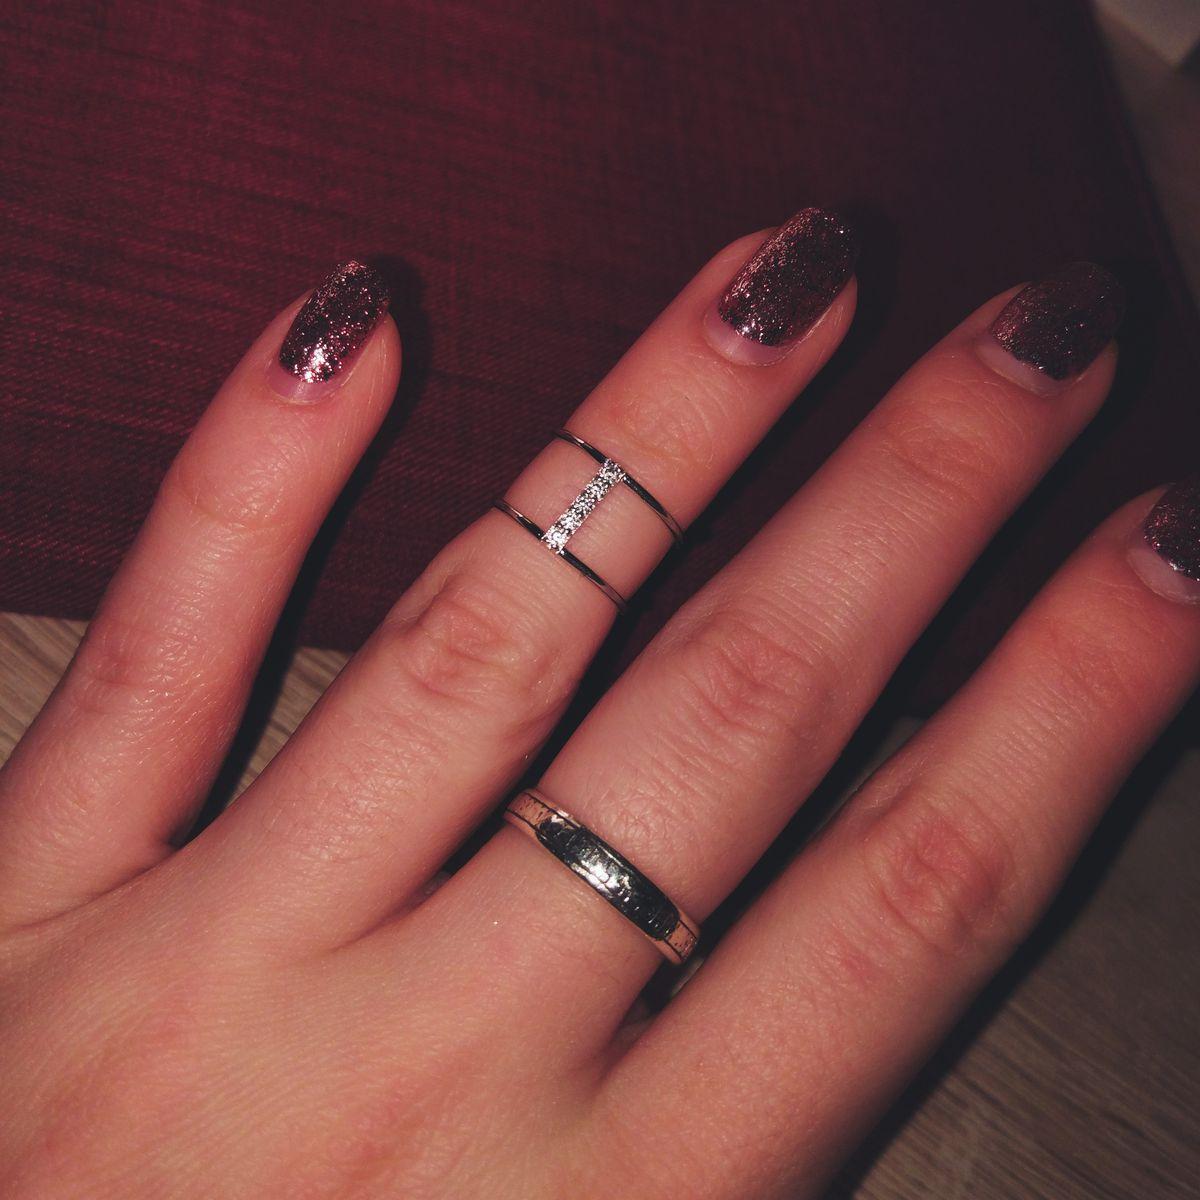 Красивое колечко на фалангу пальца 👑